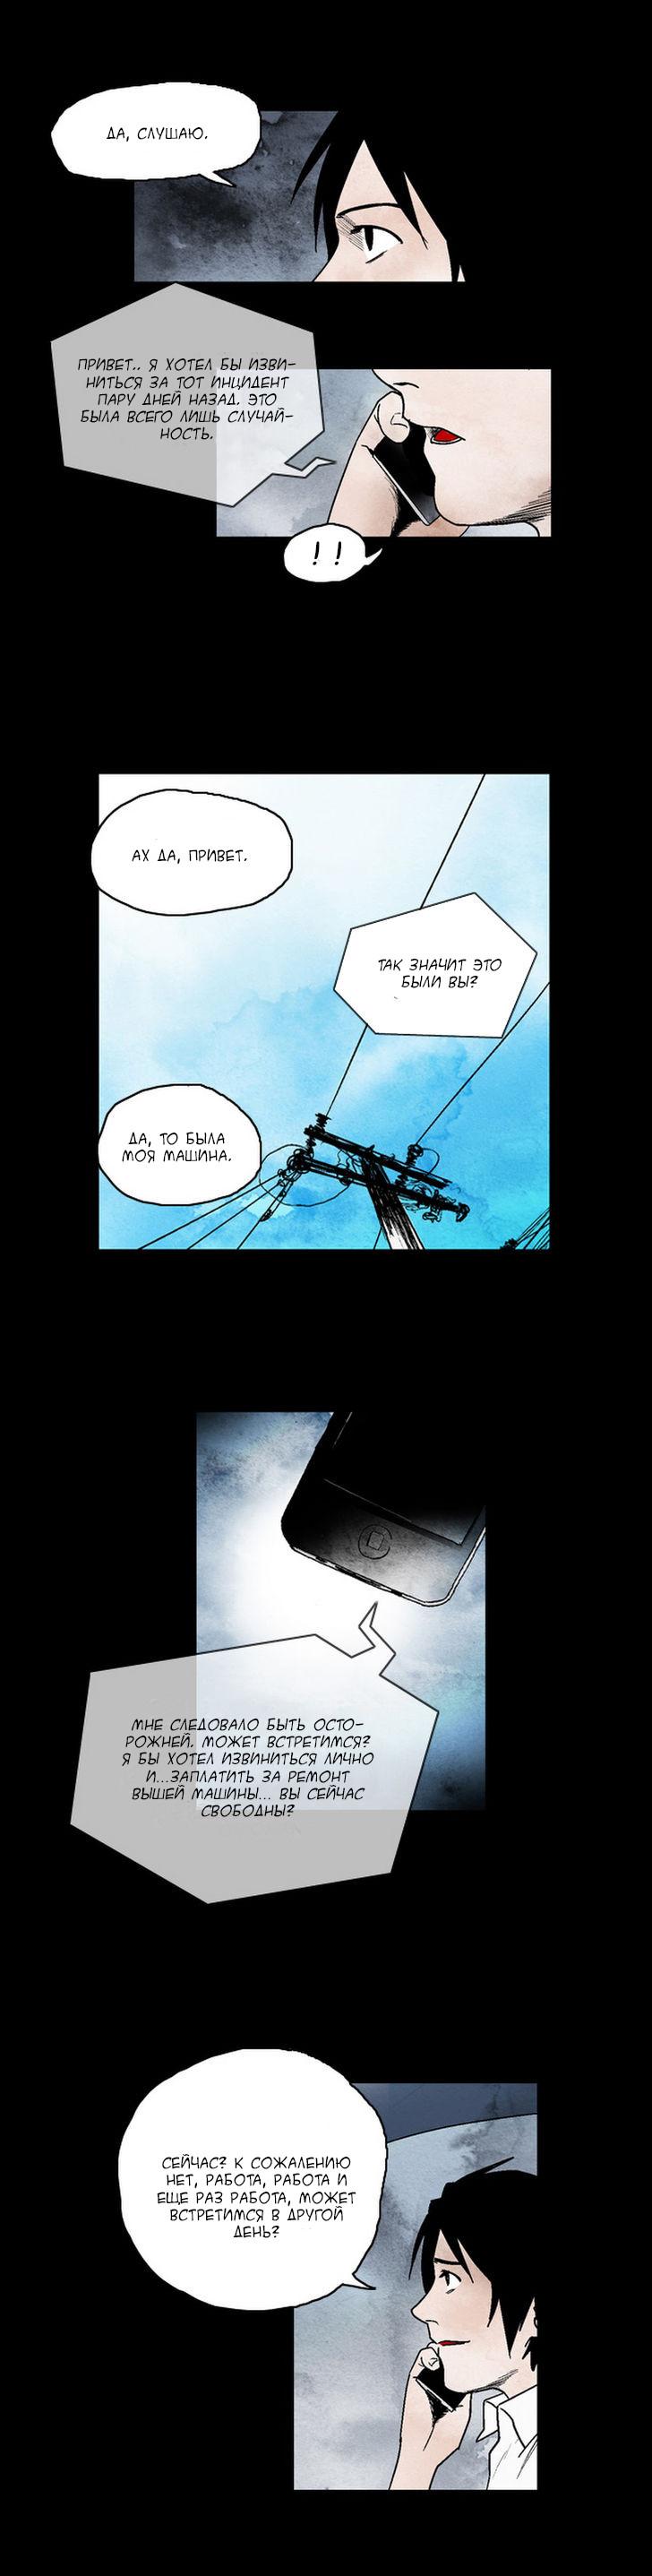 https://r1.ninemanga.com/comics/pic2/14/28302/409574/1519283745352.jpg Page 4